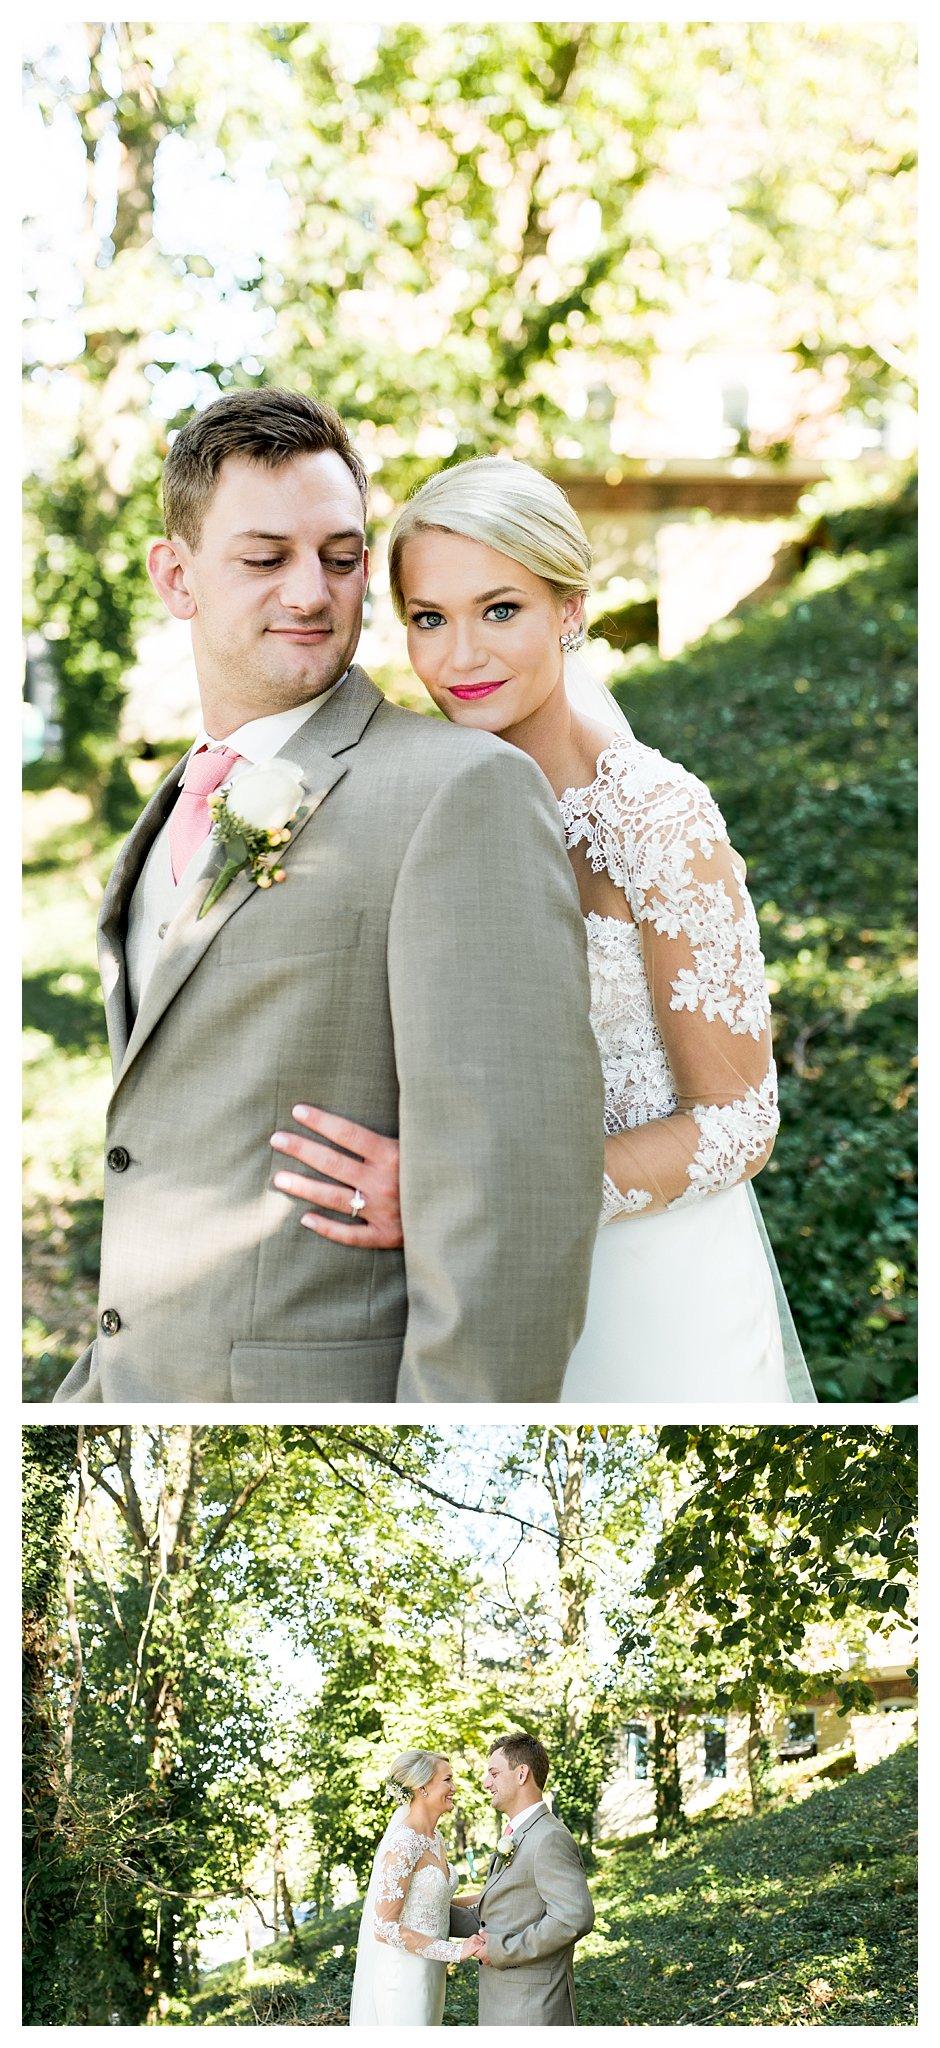 everleigh-photography-monastery-event-center-cincinnati-wedding-photographer-tara-and-elliot-heil-wedding-25